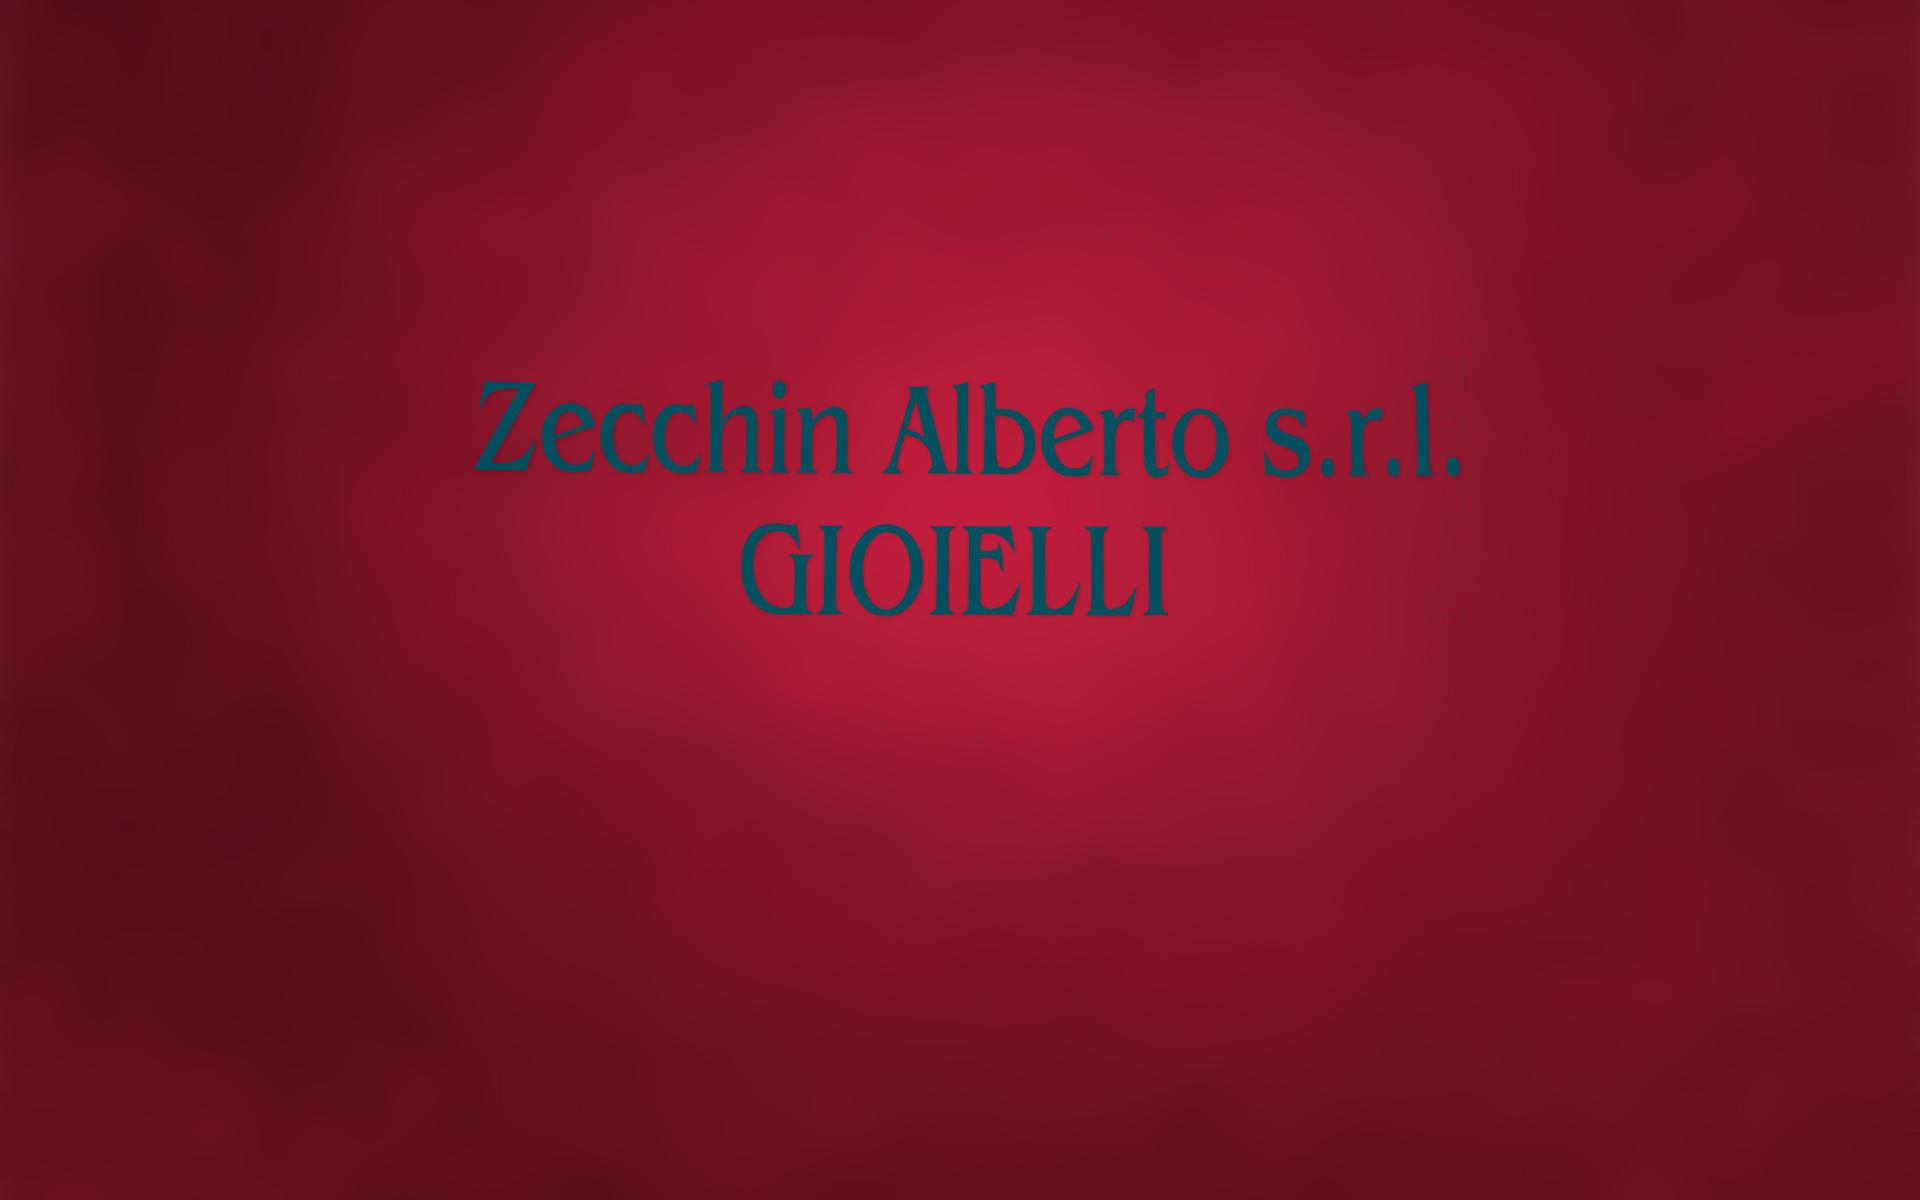 Zecchin Alberto1